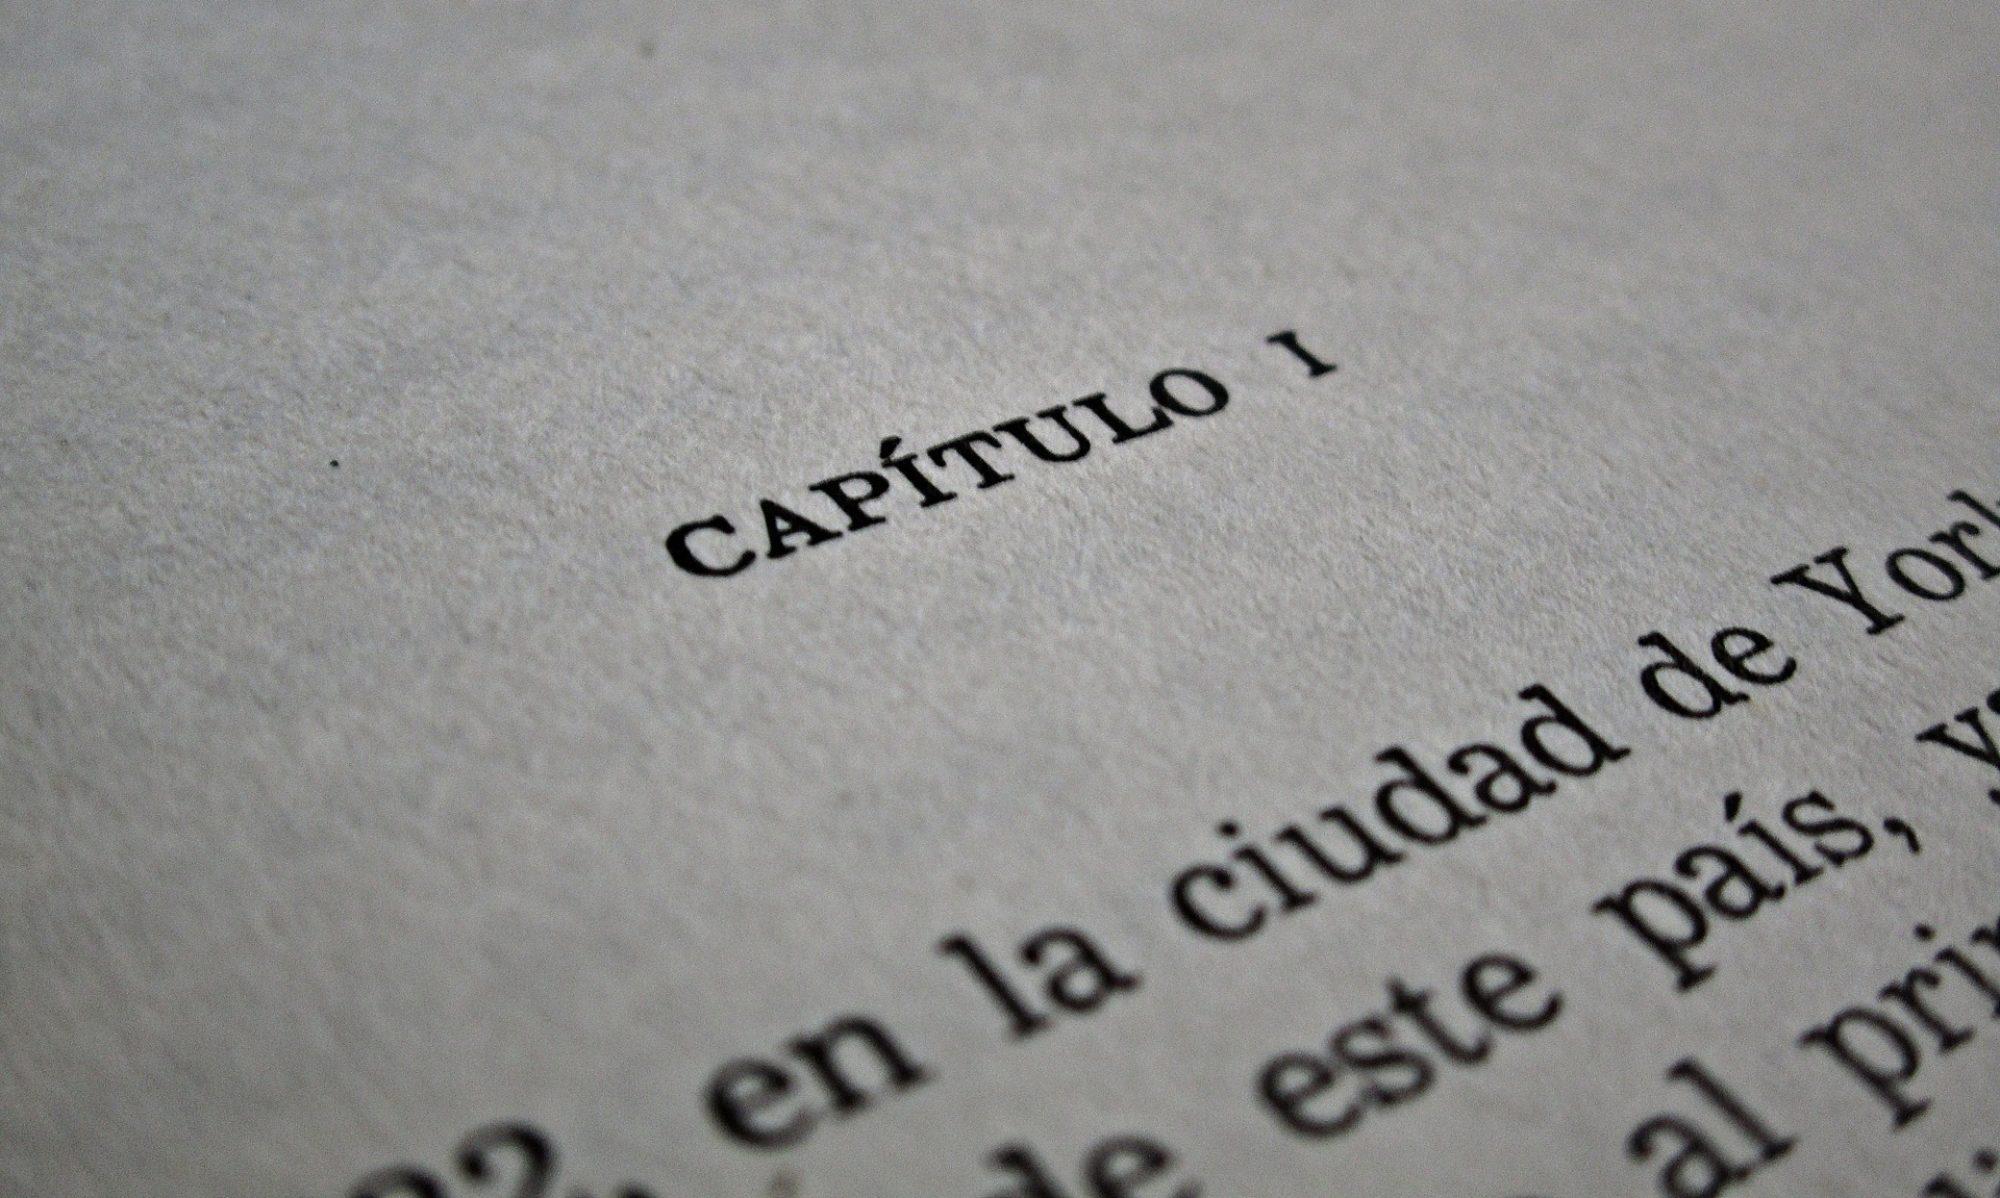 Archivio Casarrubea